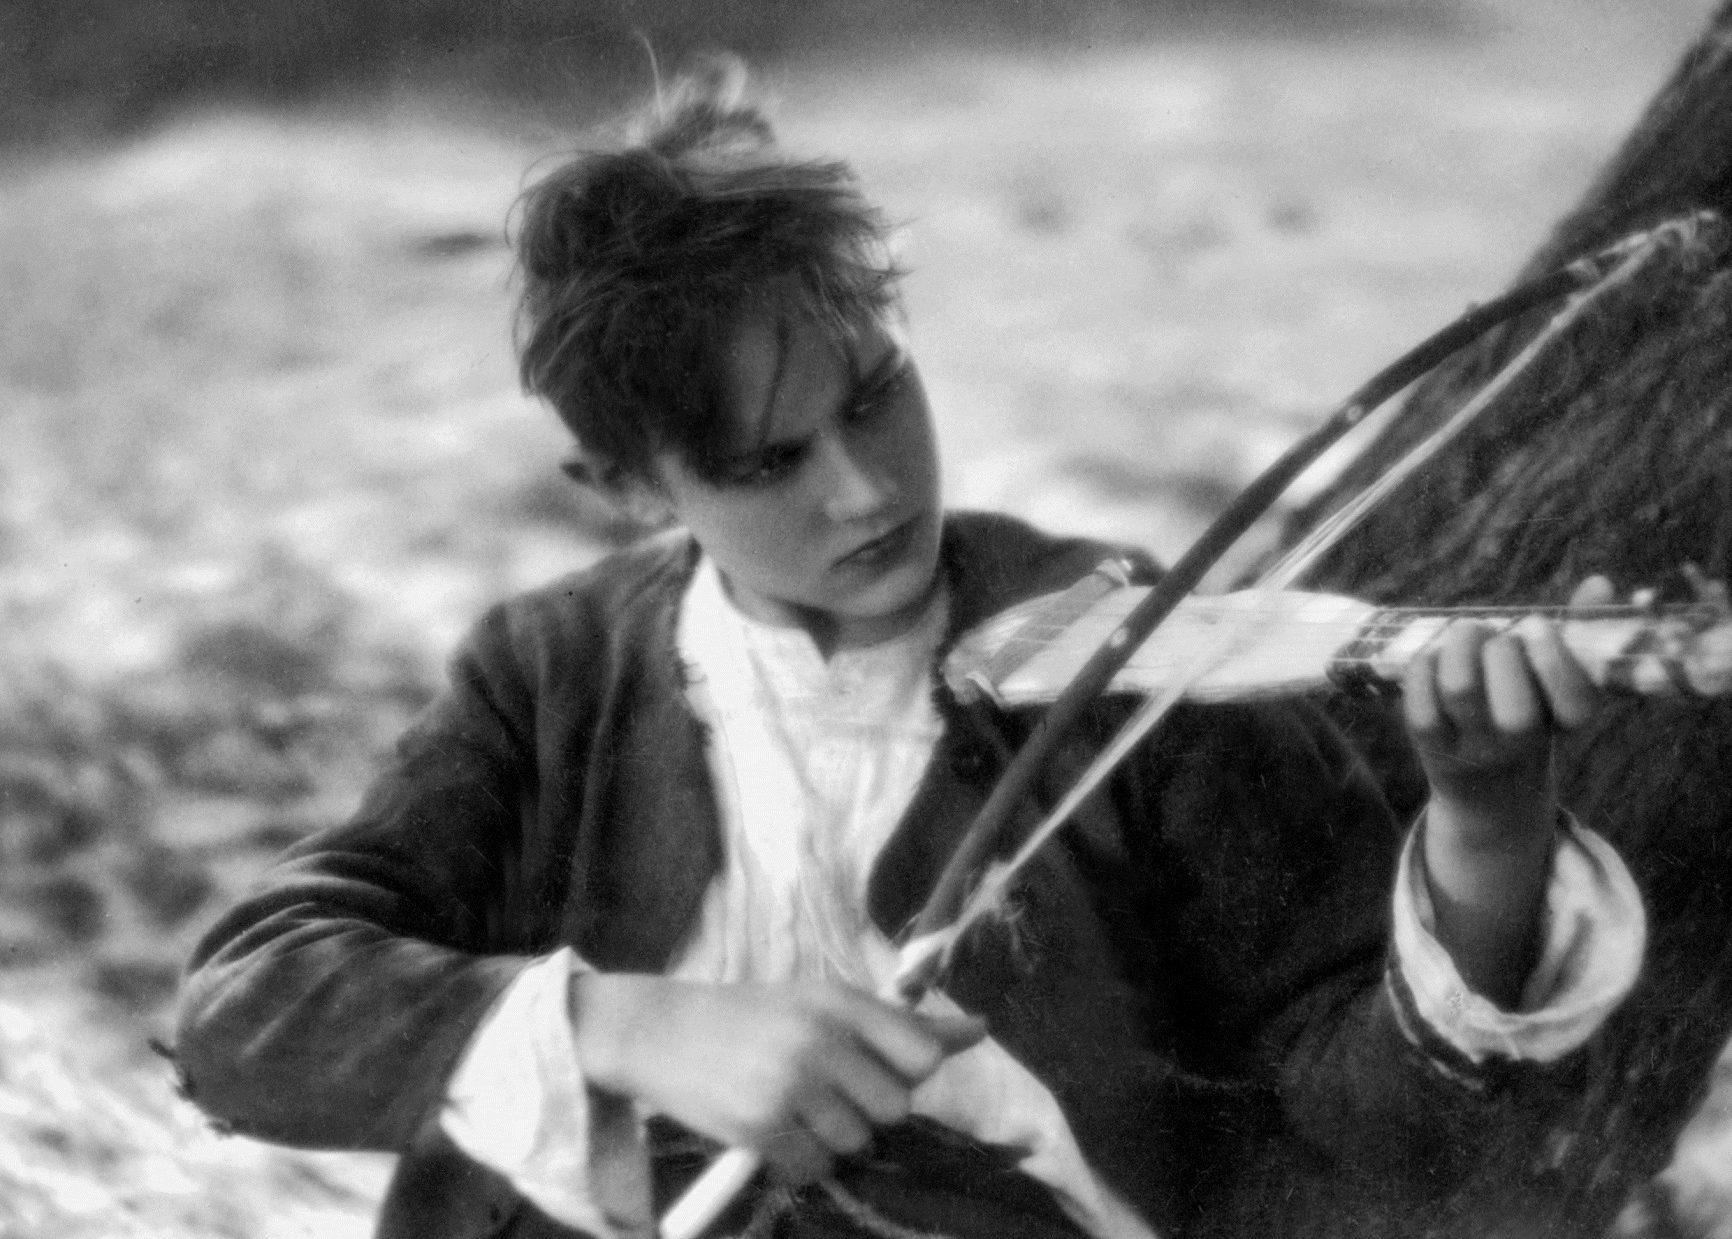 młody mężczyzna gra na skrzypcach